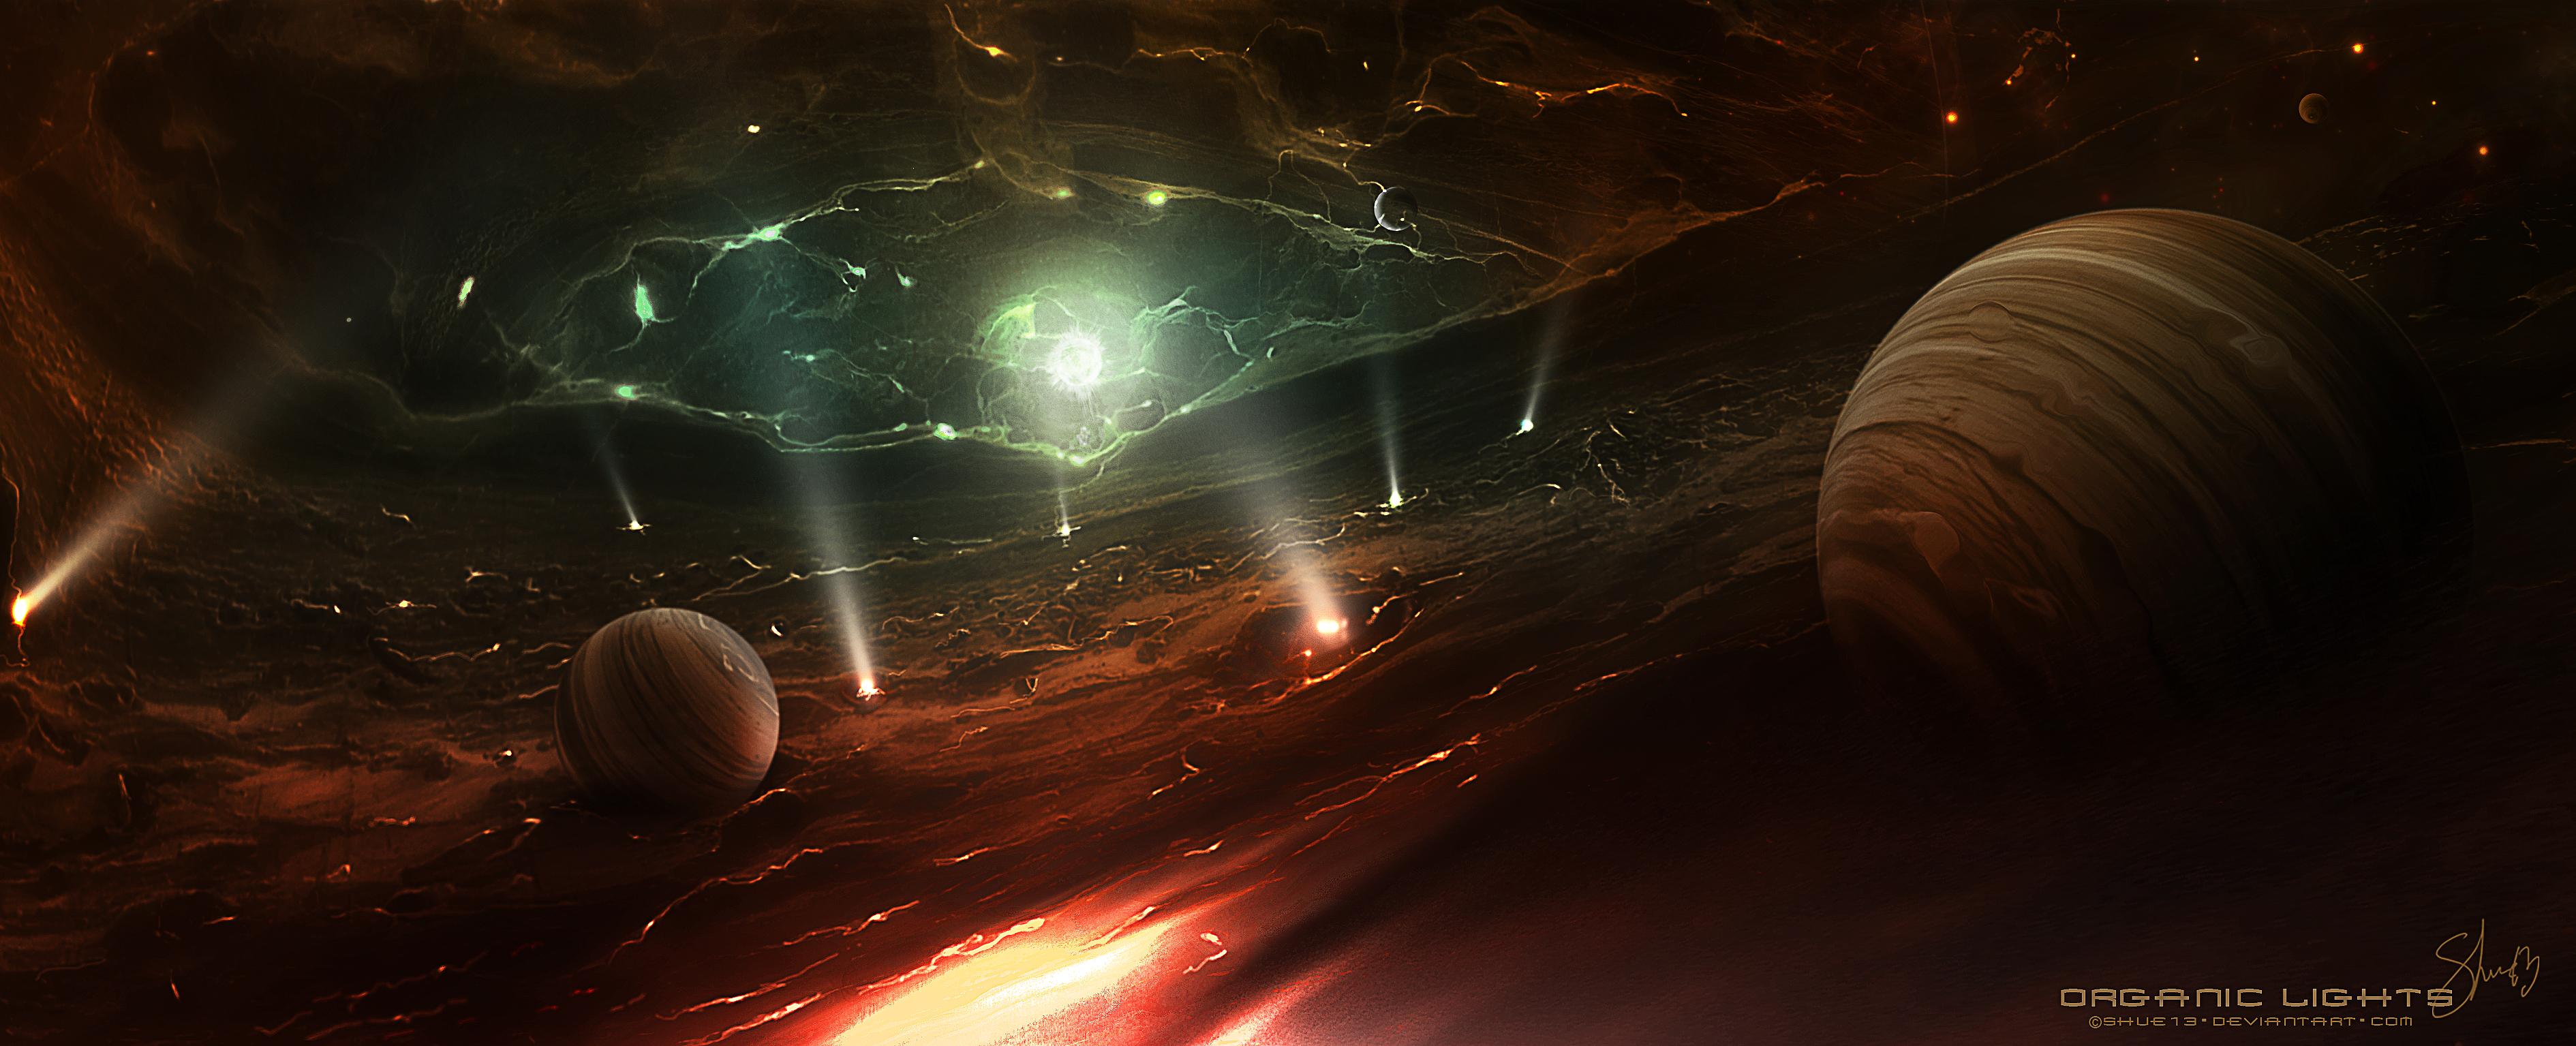 Organic Lights by Shue13